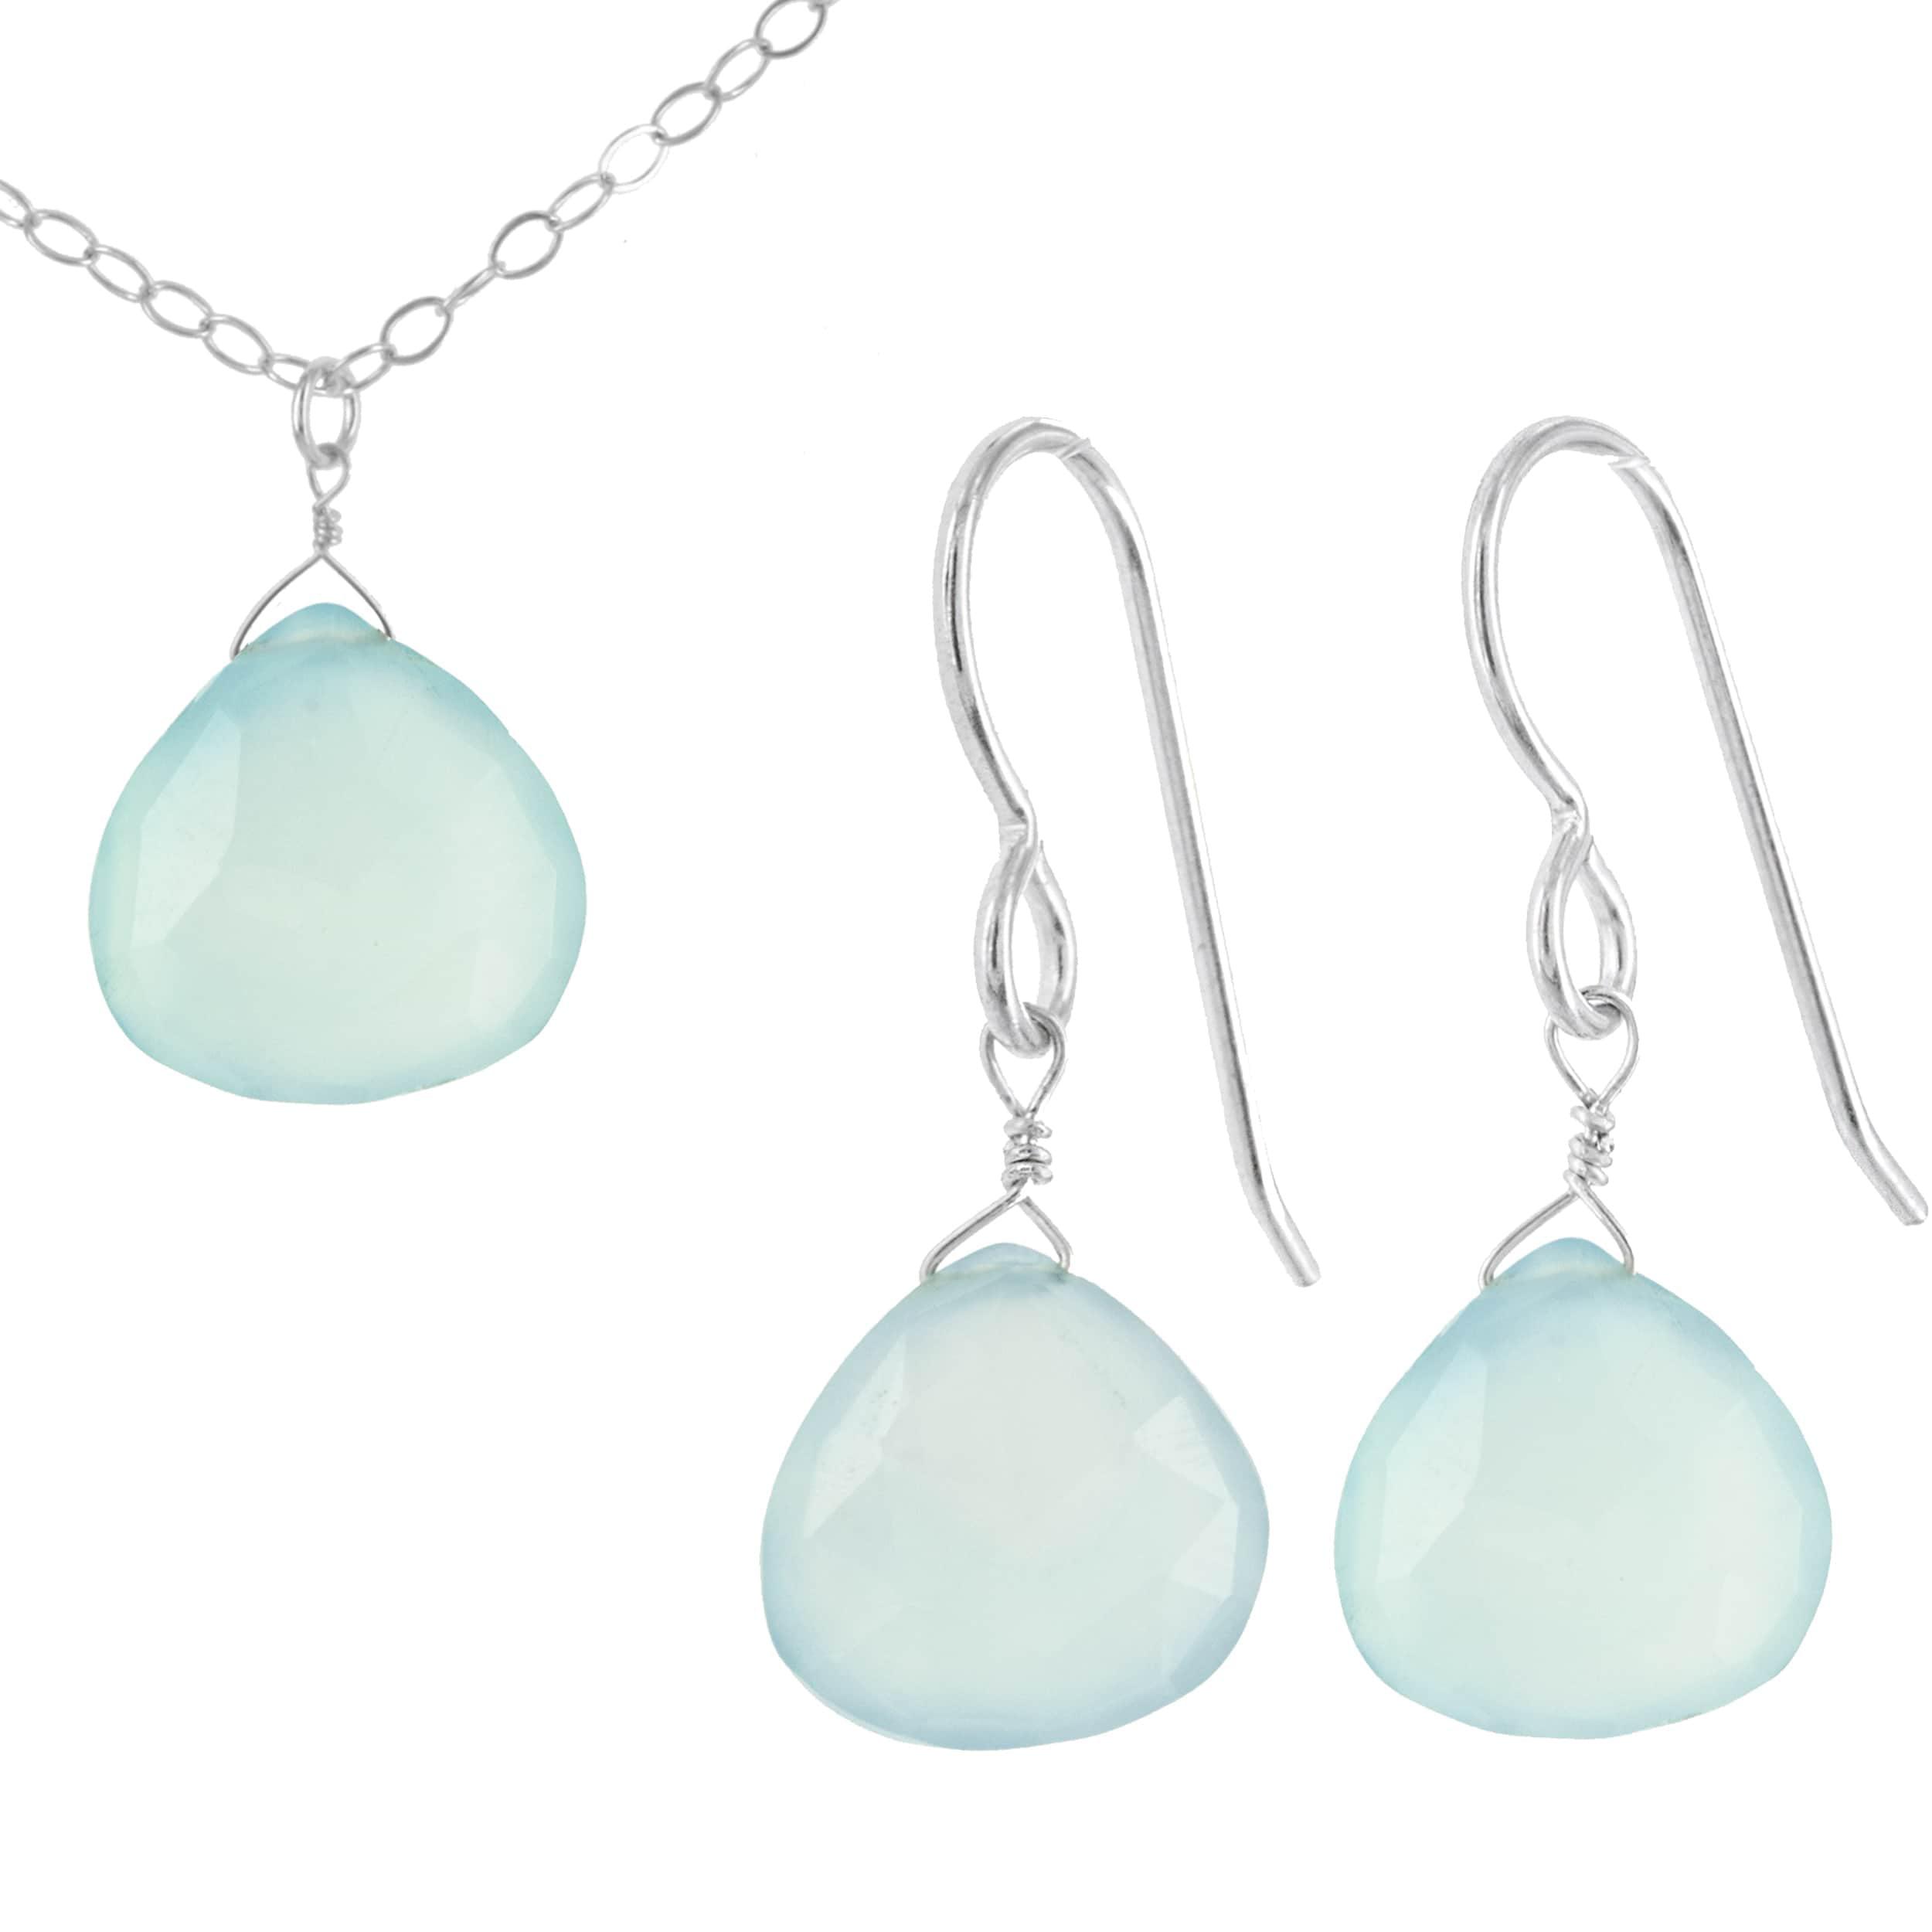 Ashanti Handmade Aqua Chalcedony Gemstone Briolette Sterling Silver Earring and Necklace Set (Sri Lanka) by Overstock